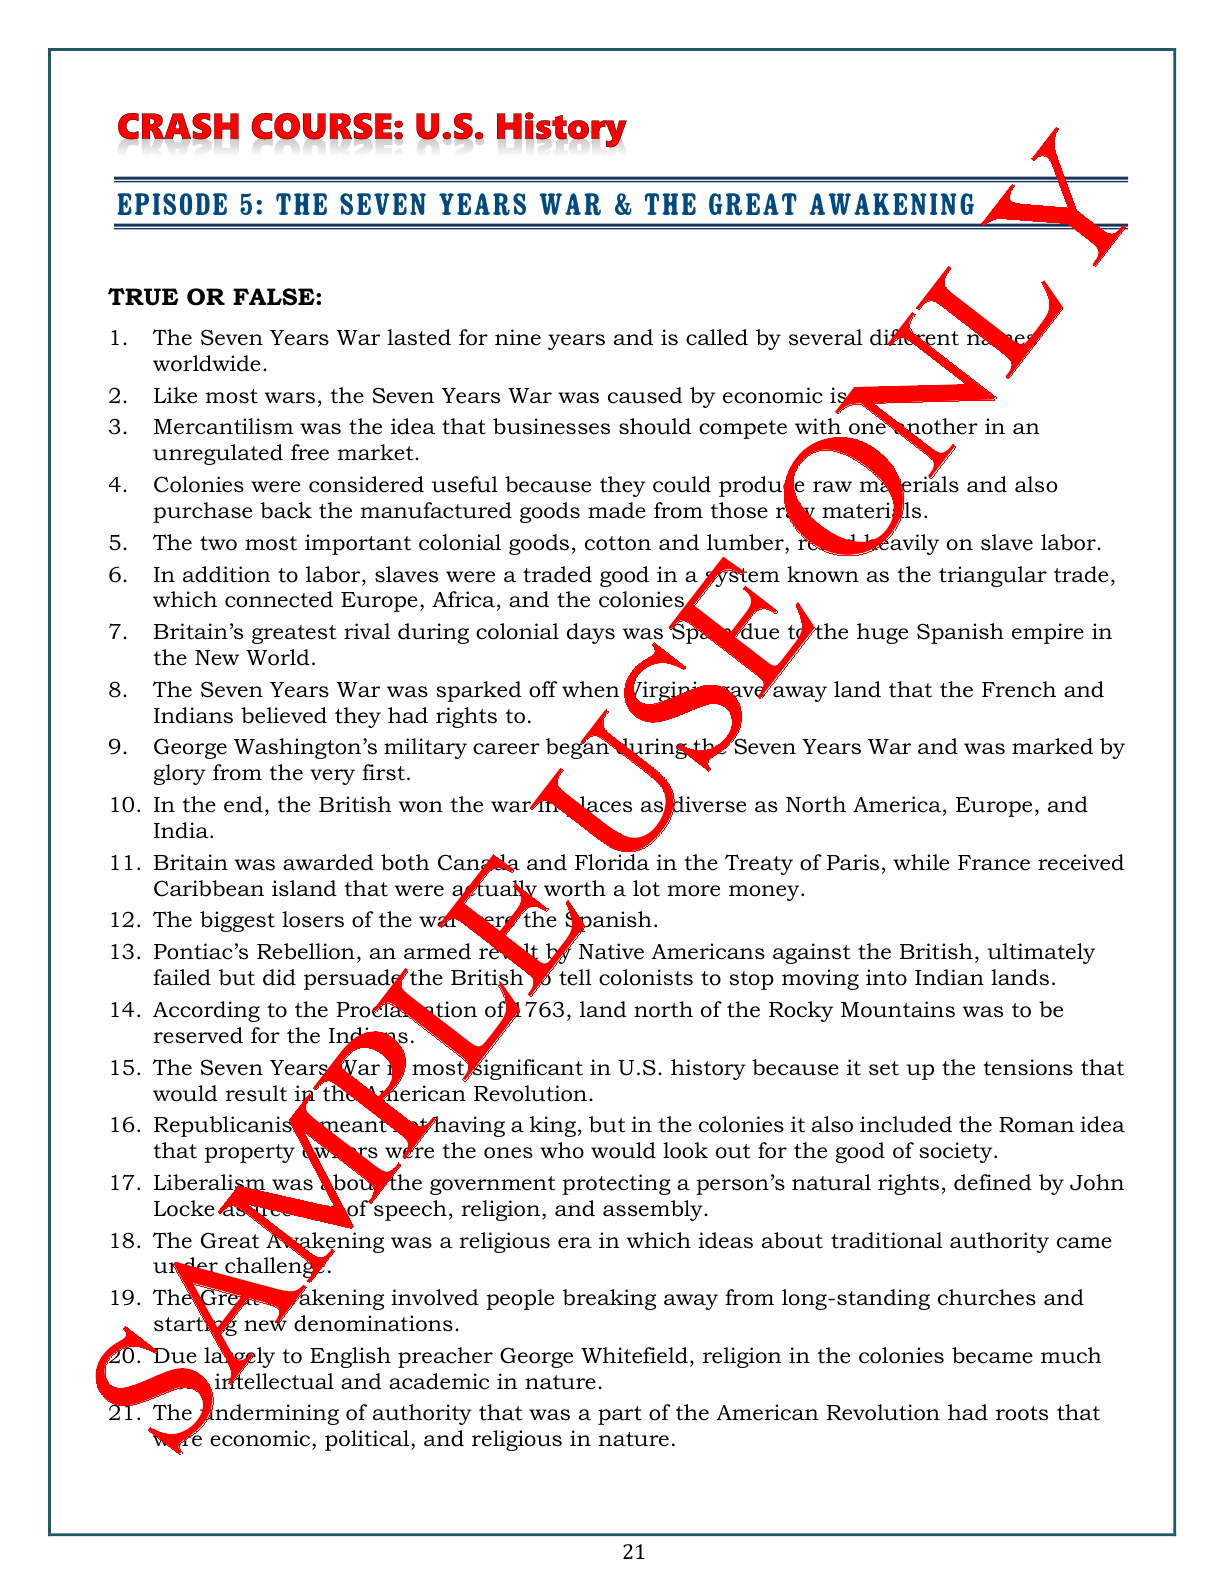 Crash Course U.s. History Worksheets Make Teaching